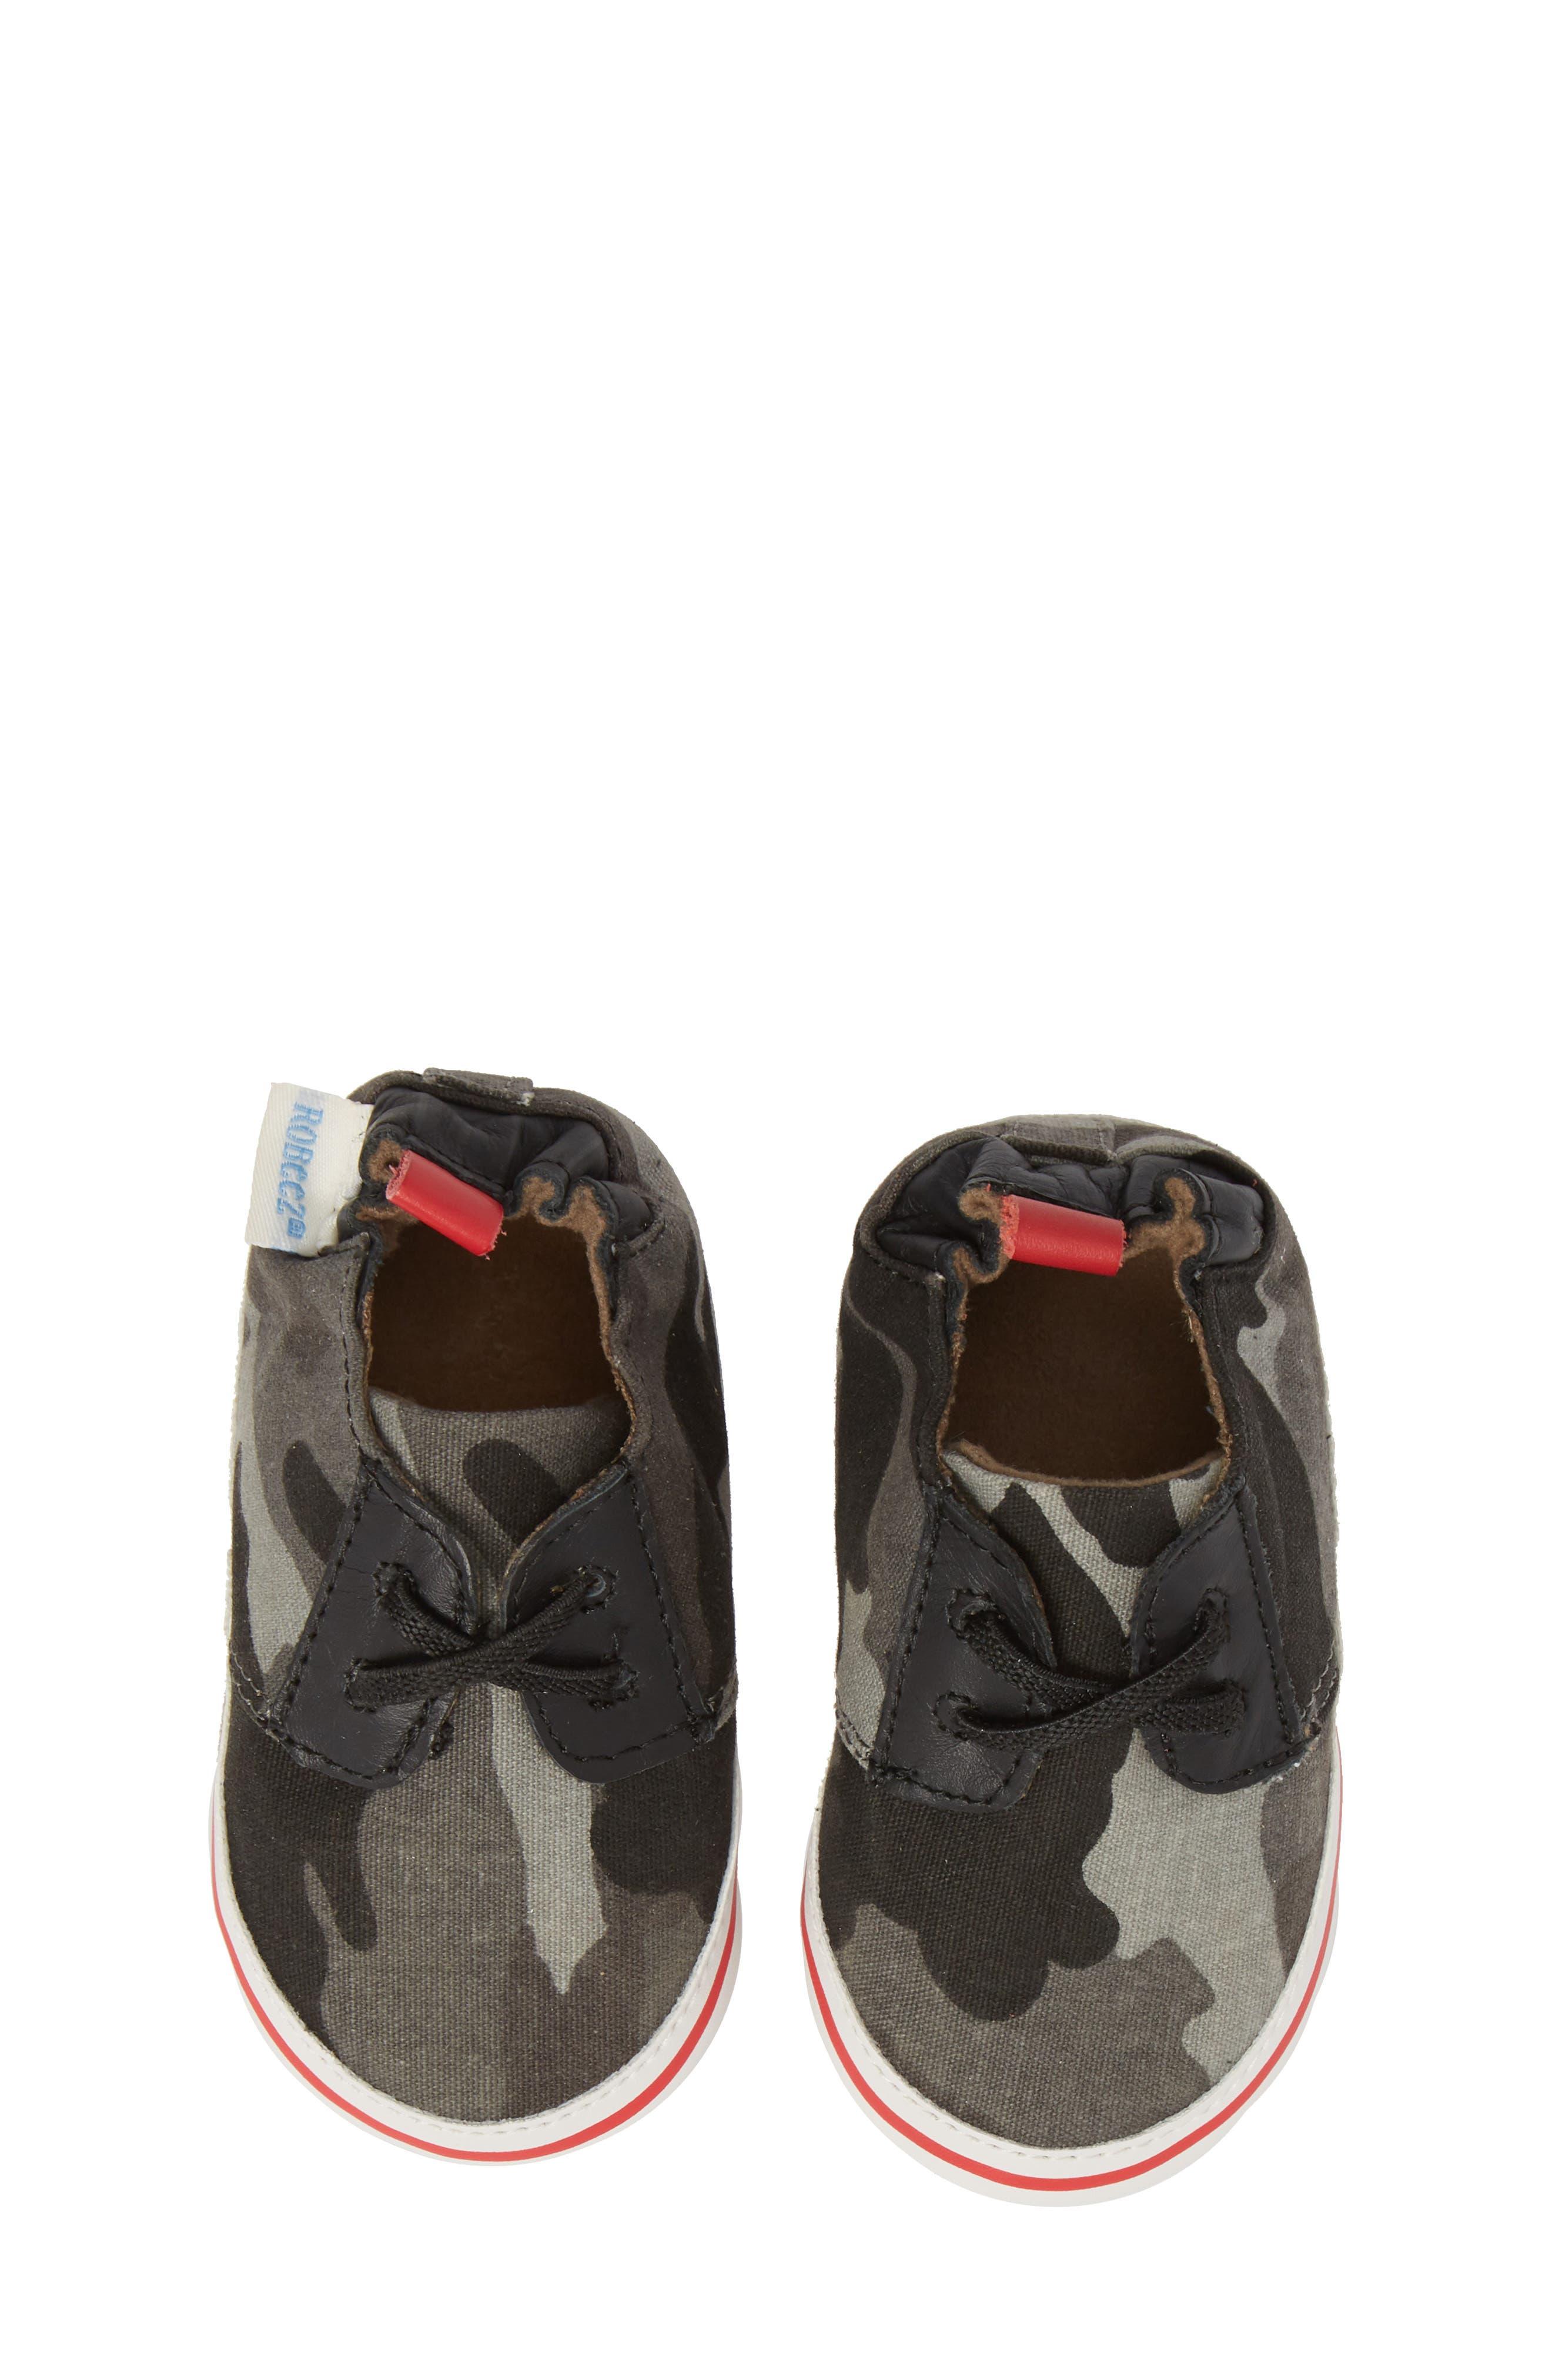 Cool & Casual Camo Print Crib Shoe,                             Alternate thumbnail 5, color,                             Grey